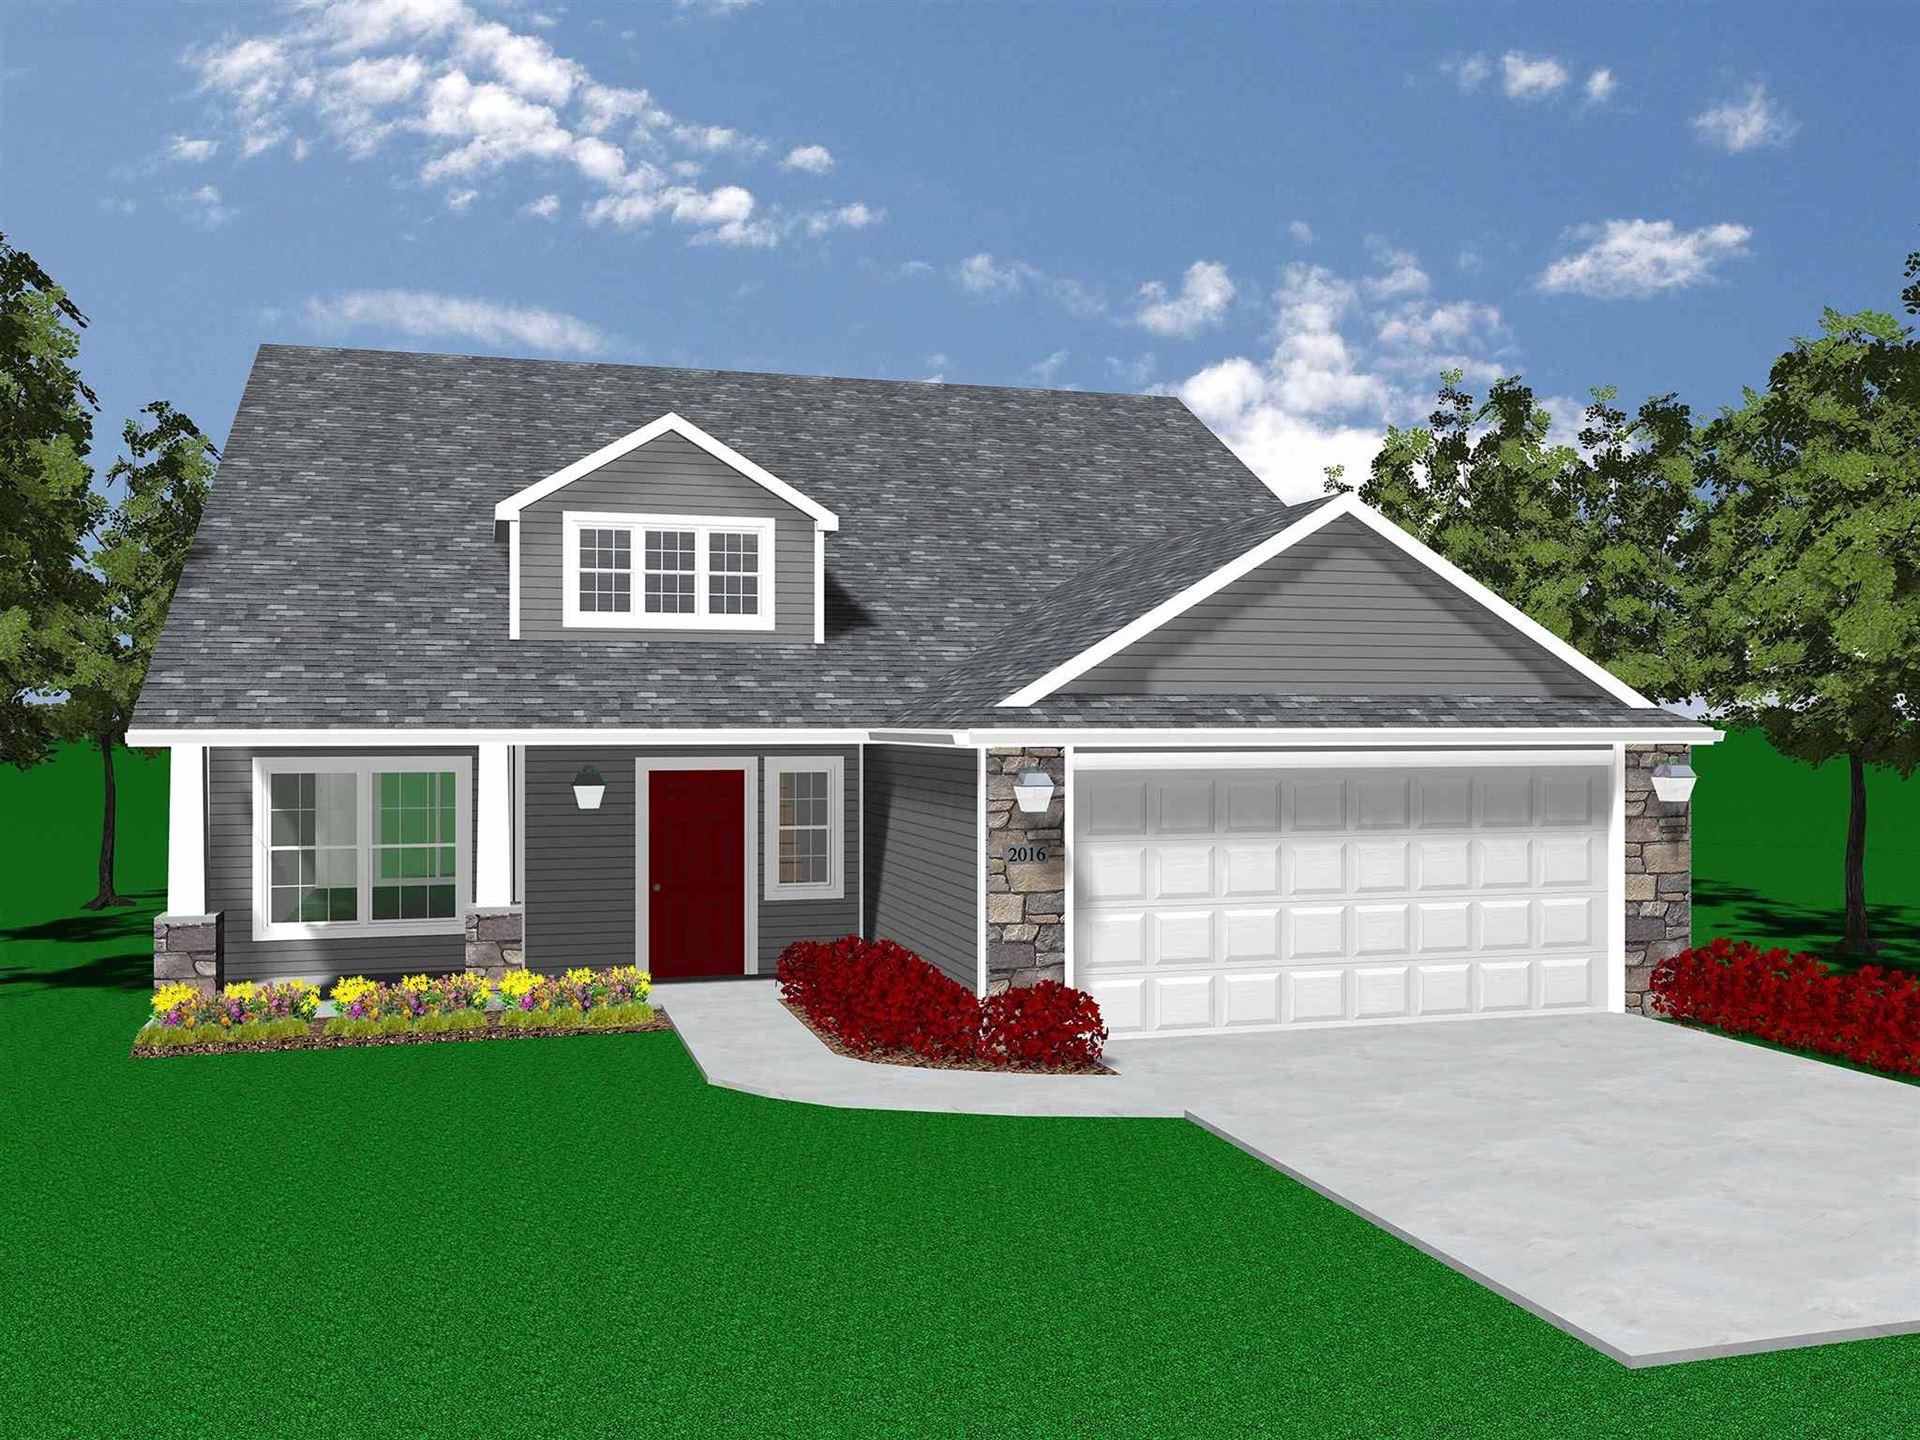 453 Barnsley Cove, Fort Wayne, IN 46845 - #: 202012741